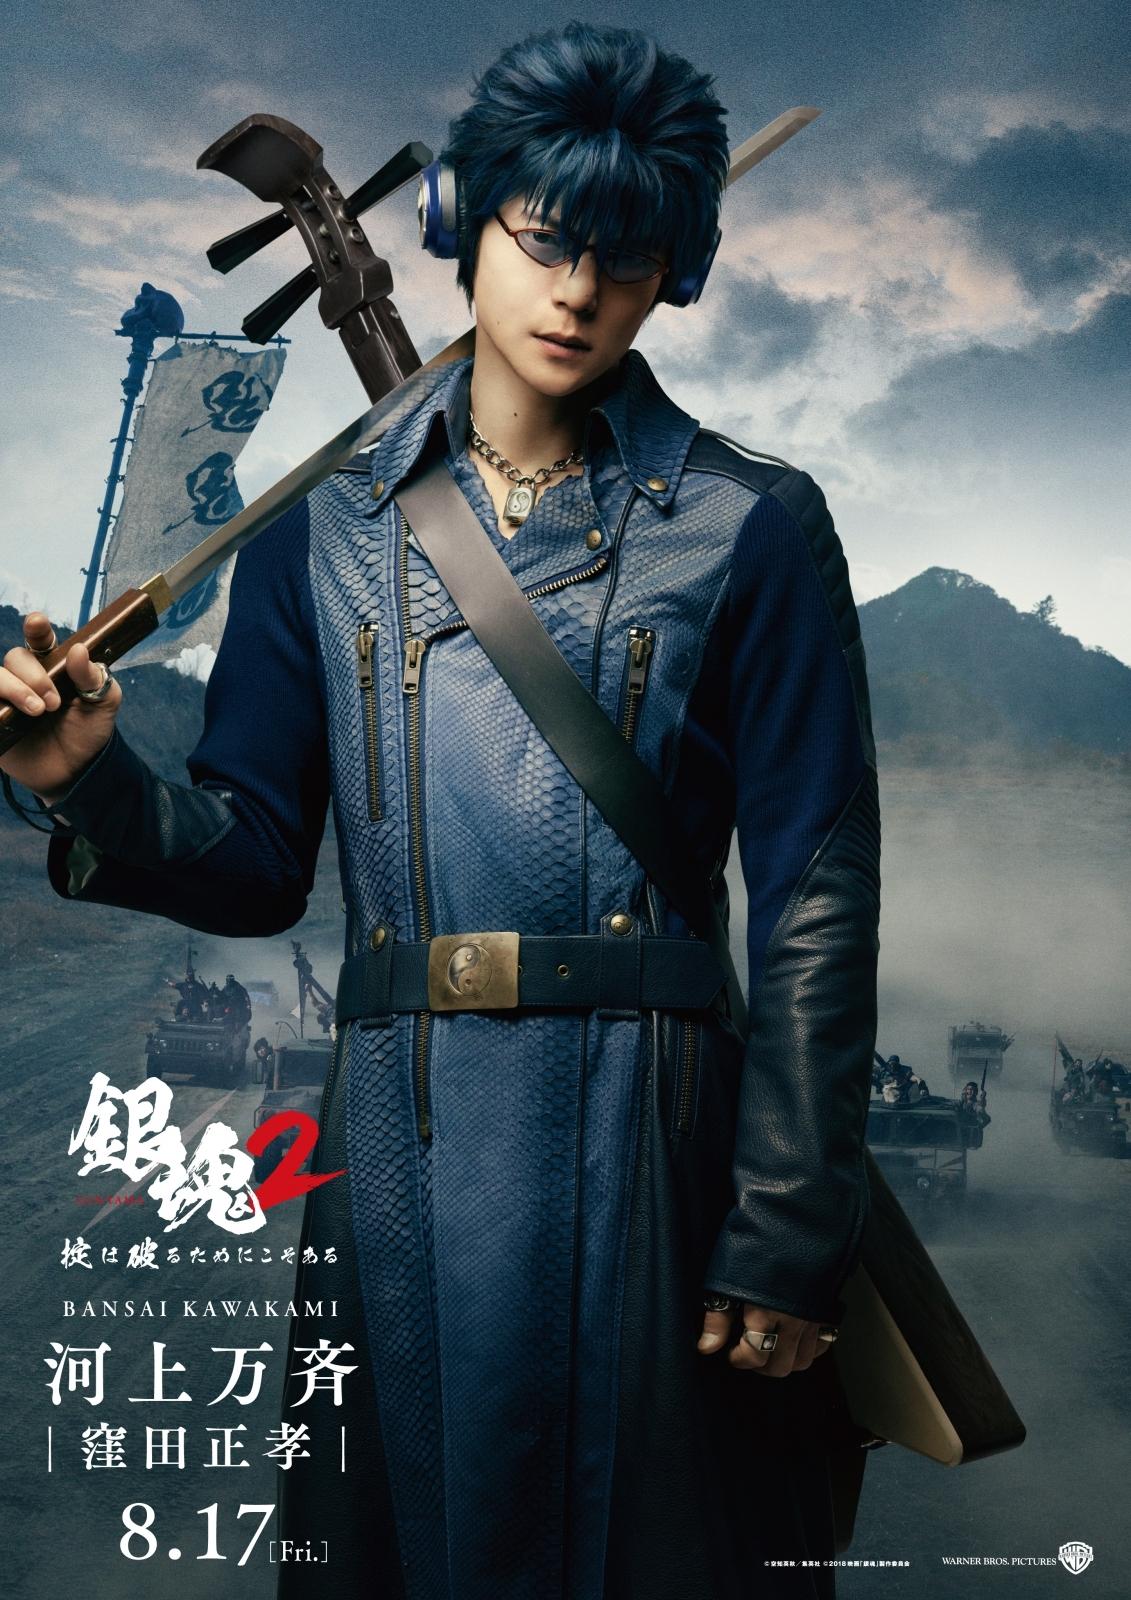 (C)空知英秋/集英社 (C)2018 映画「銀魂2(仮)」製作委員会